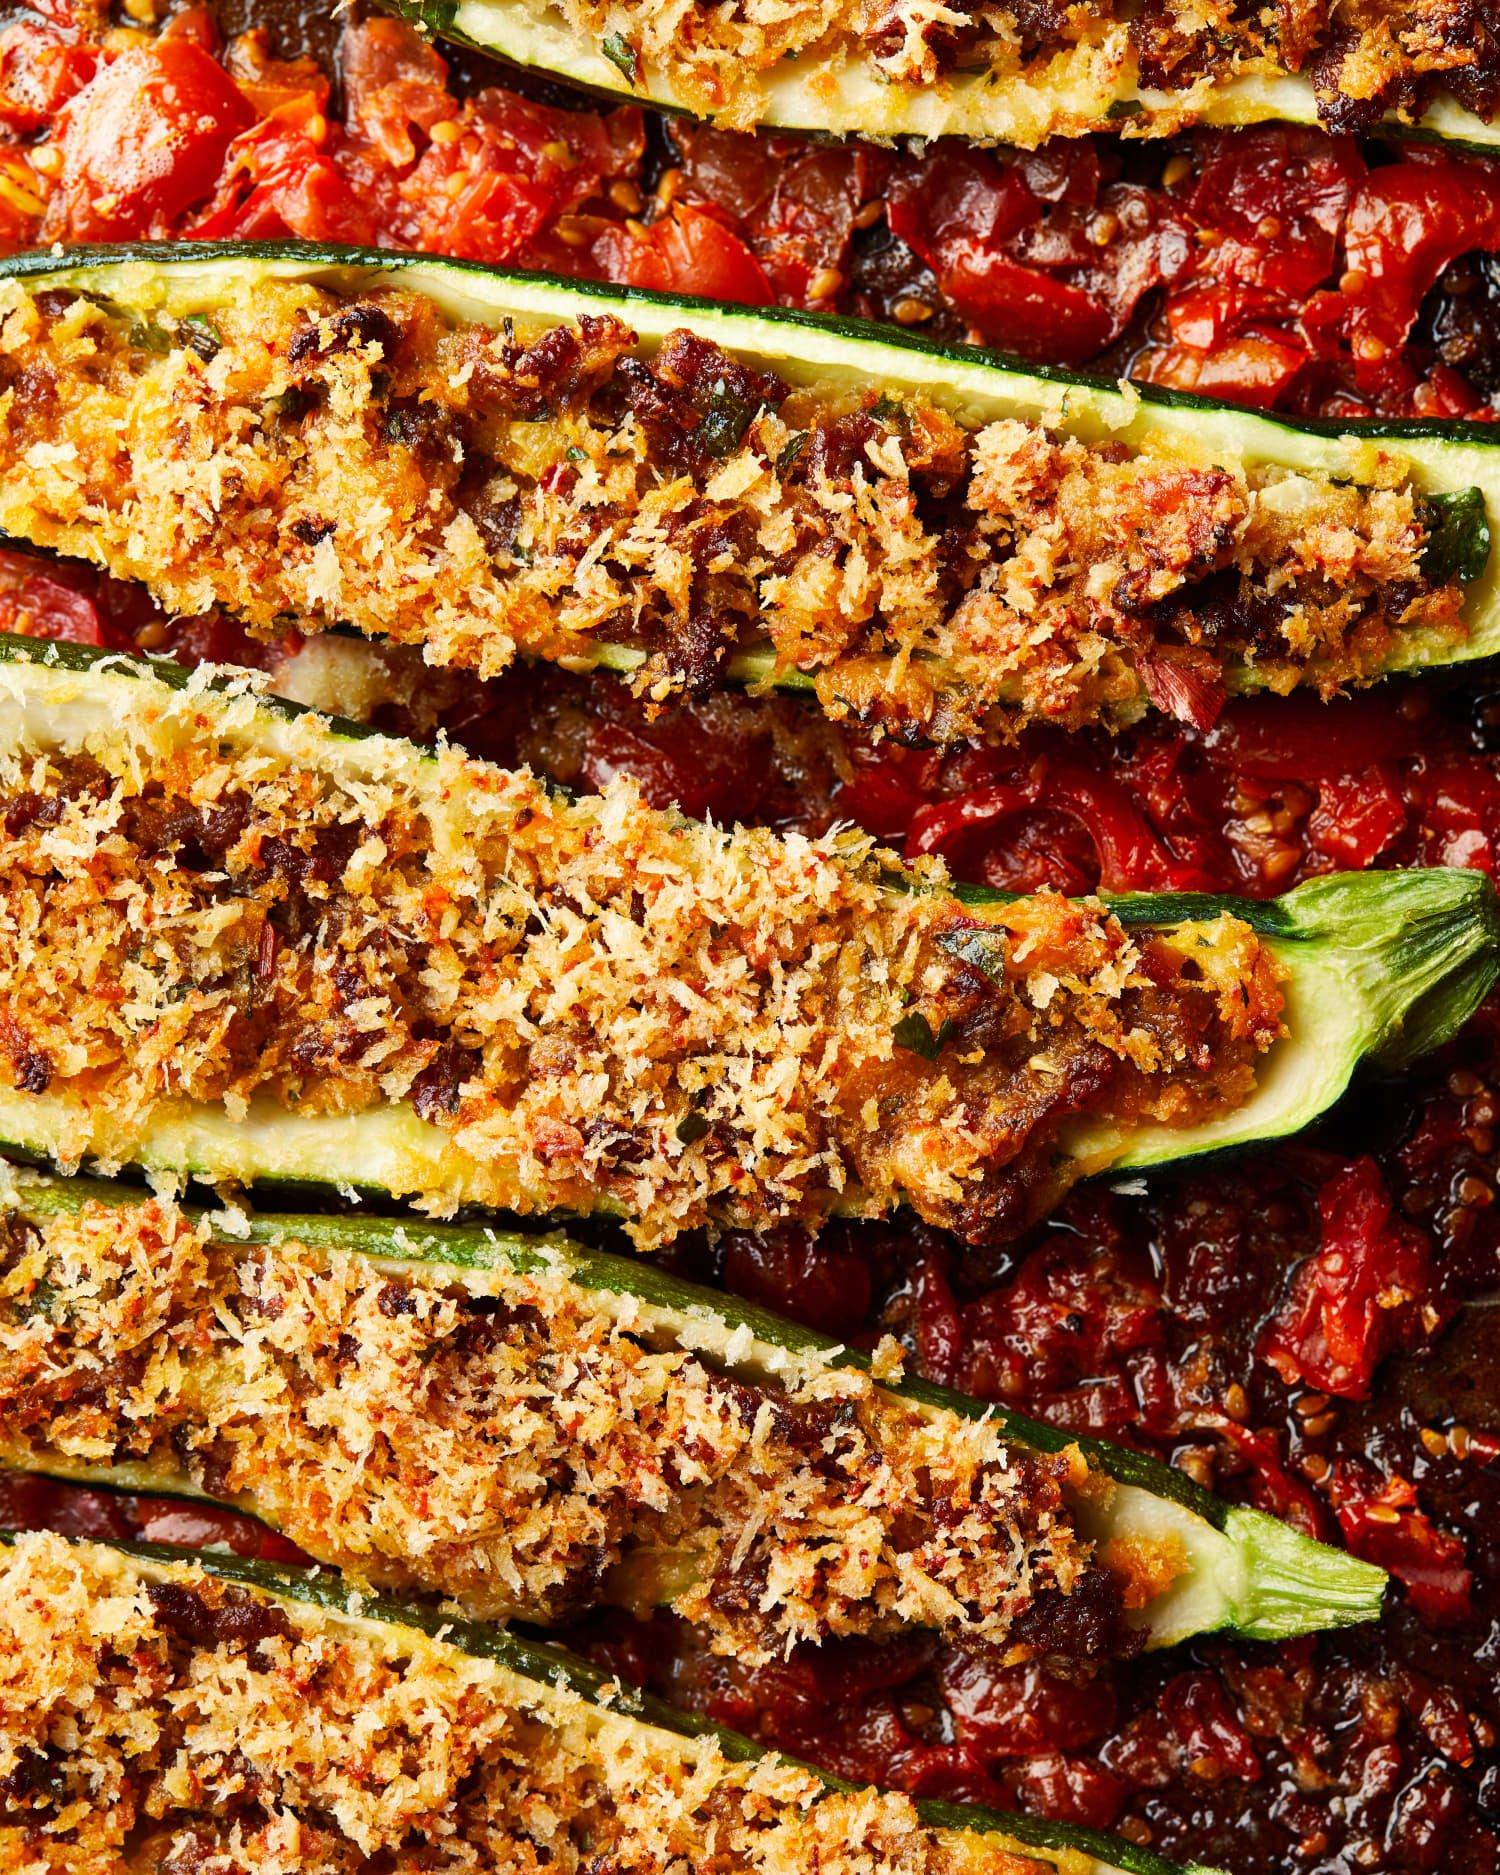 Sausage-Stuffed Zucchini Boats Are a Crispy, Saucy Summer Delight